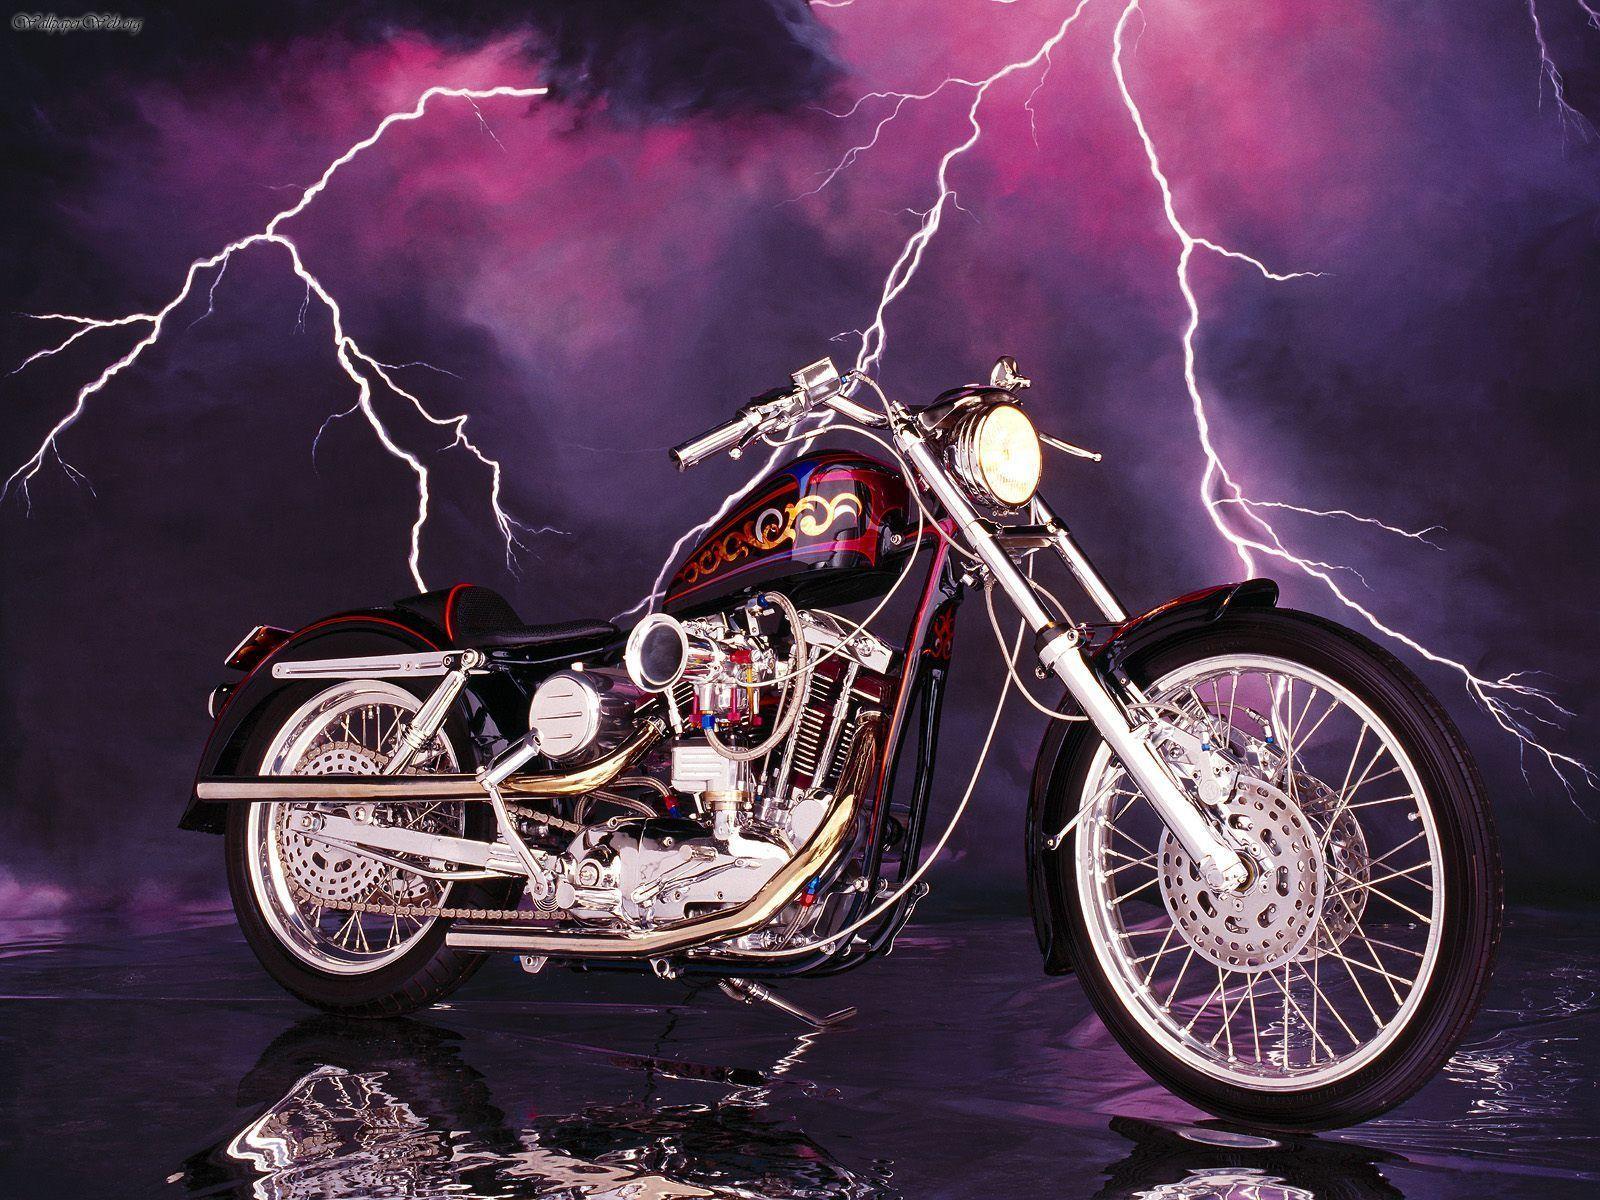 Motor Harley Davidson   Xlh Sportster picture nr 25029 1600x1200